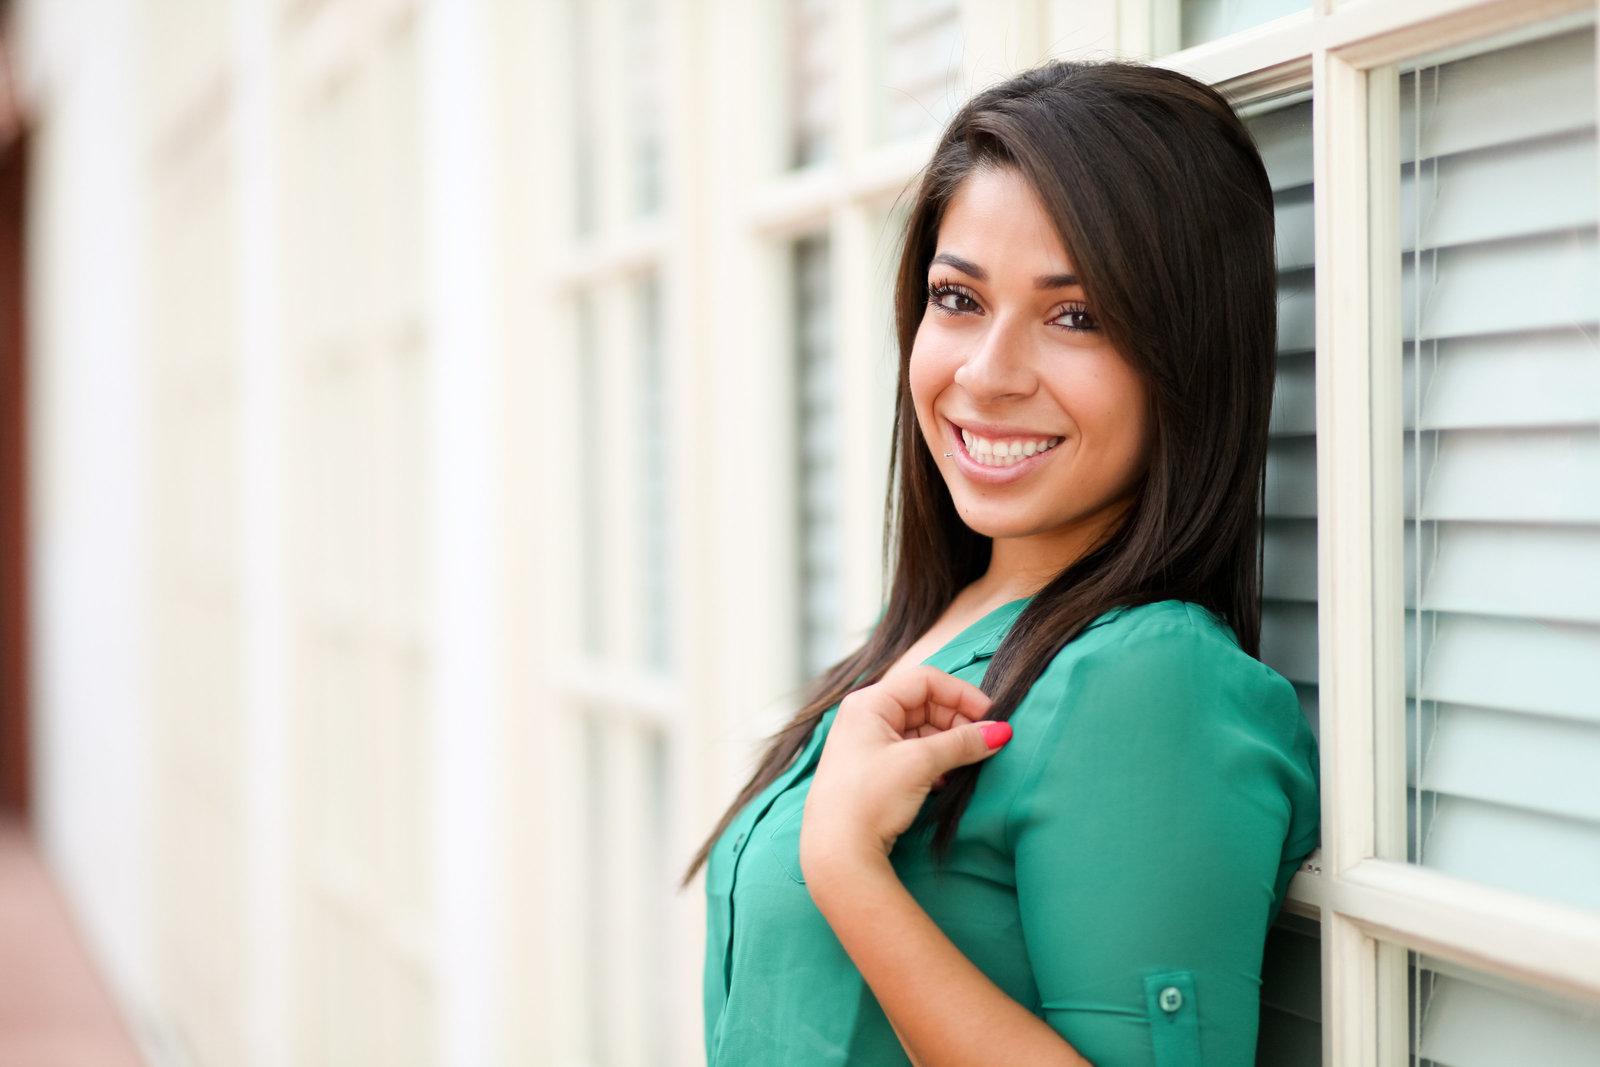 Beaverton high school senior photo against a window | Susie Moreno Photography